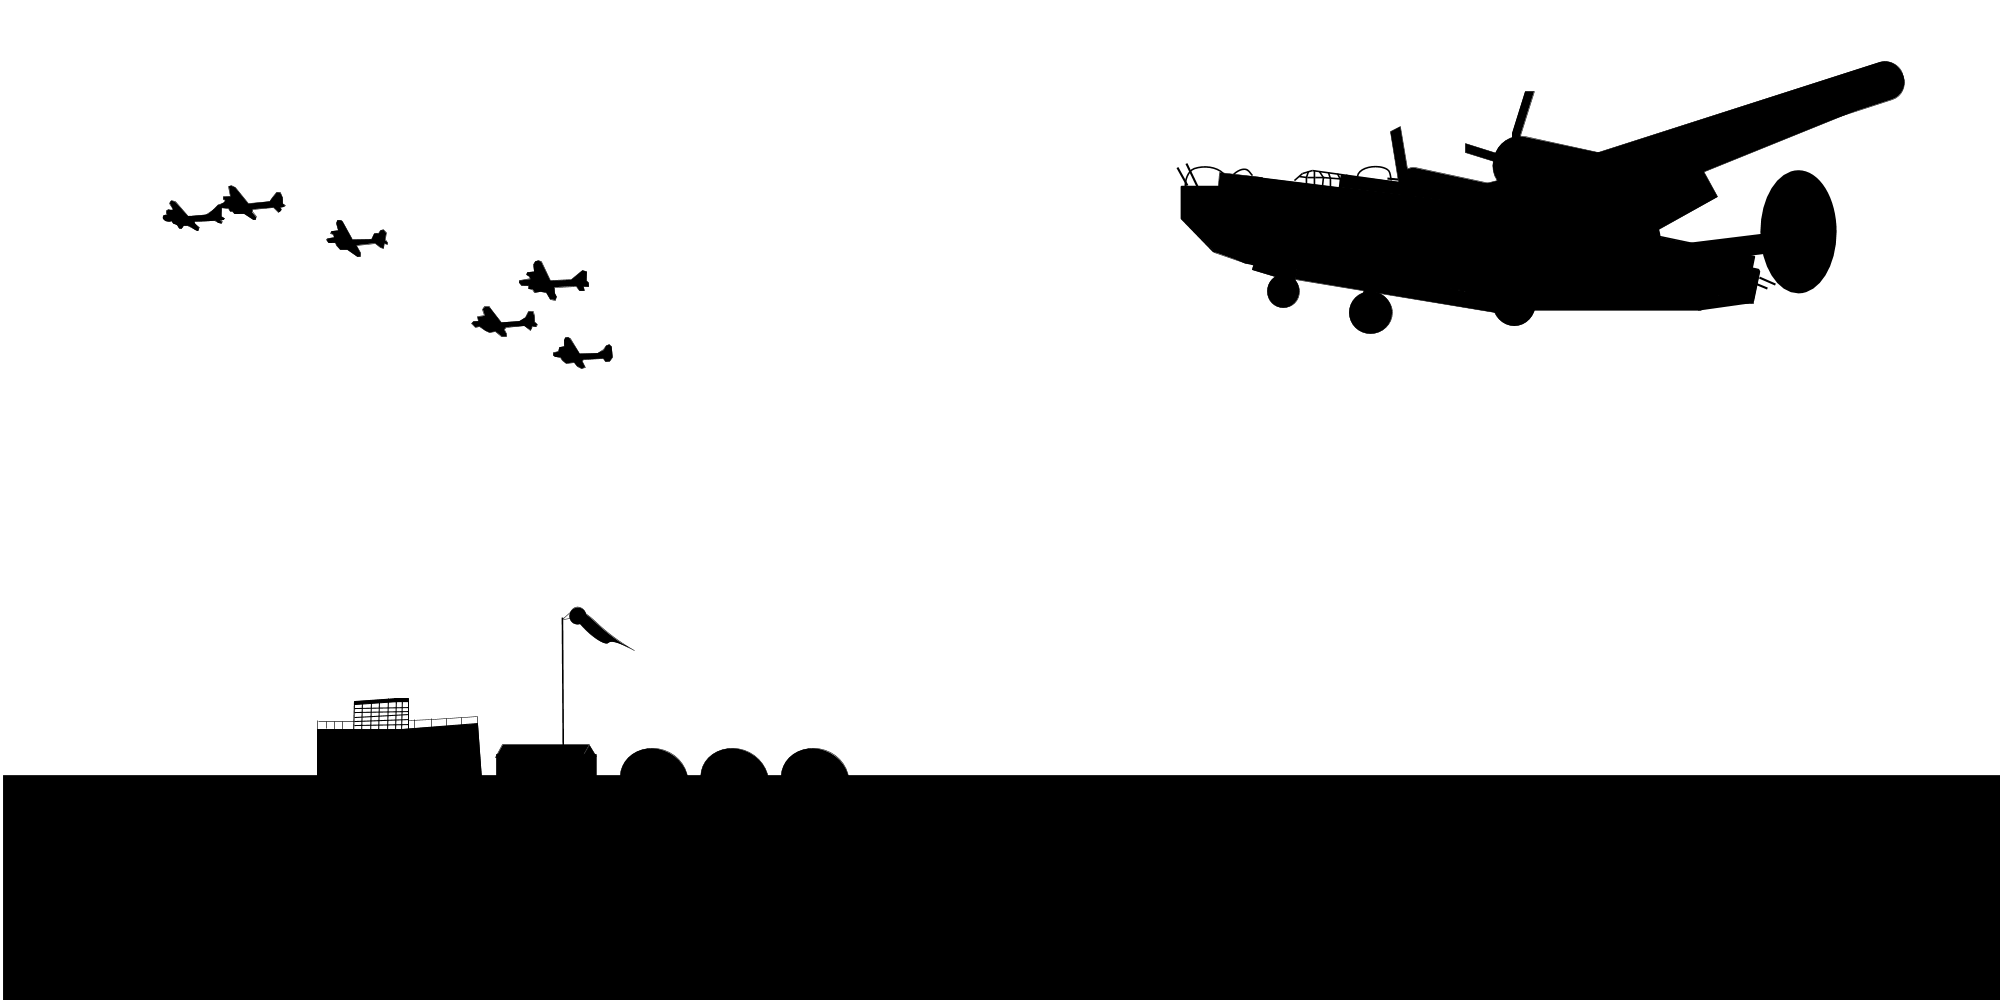 Panel Bottom 04